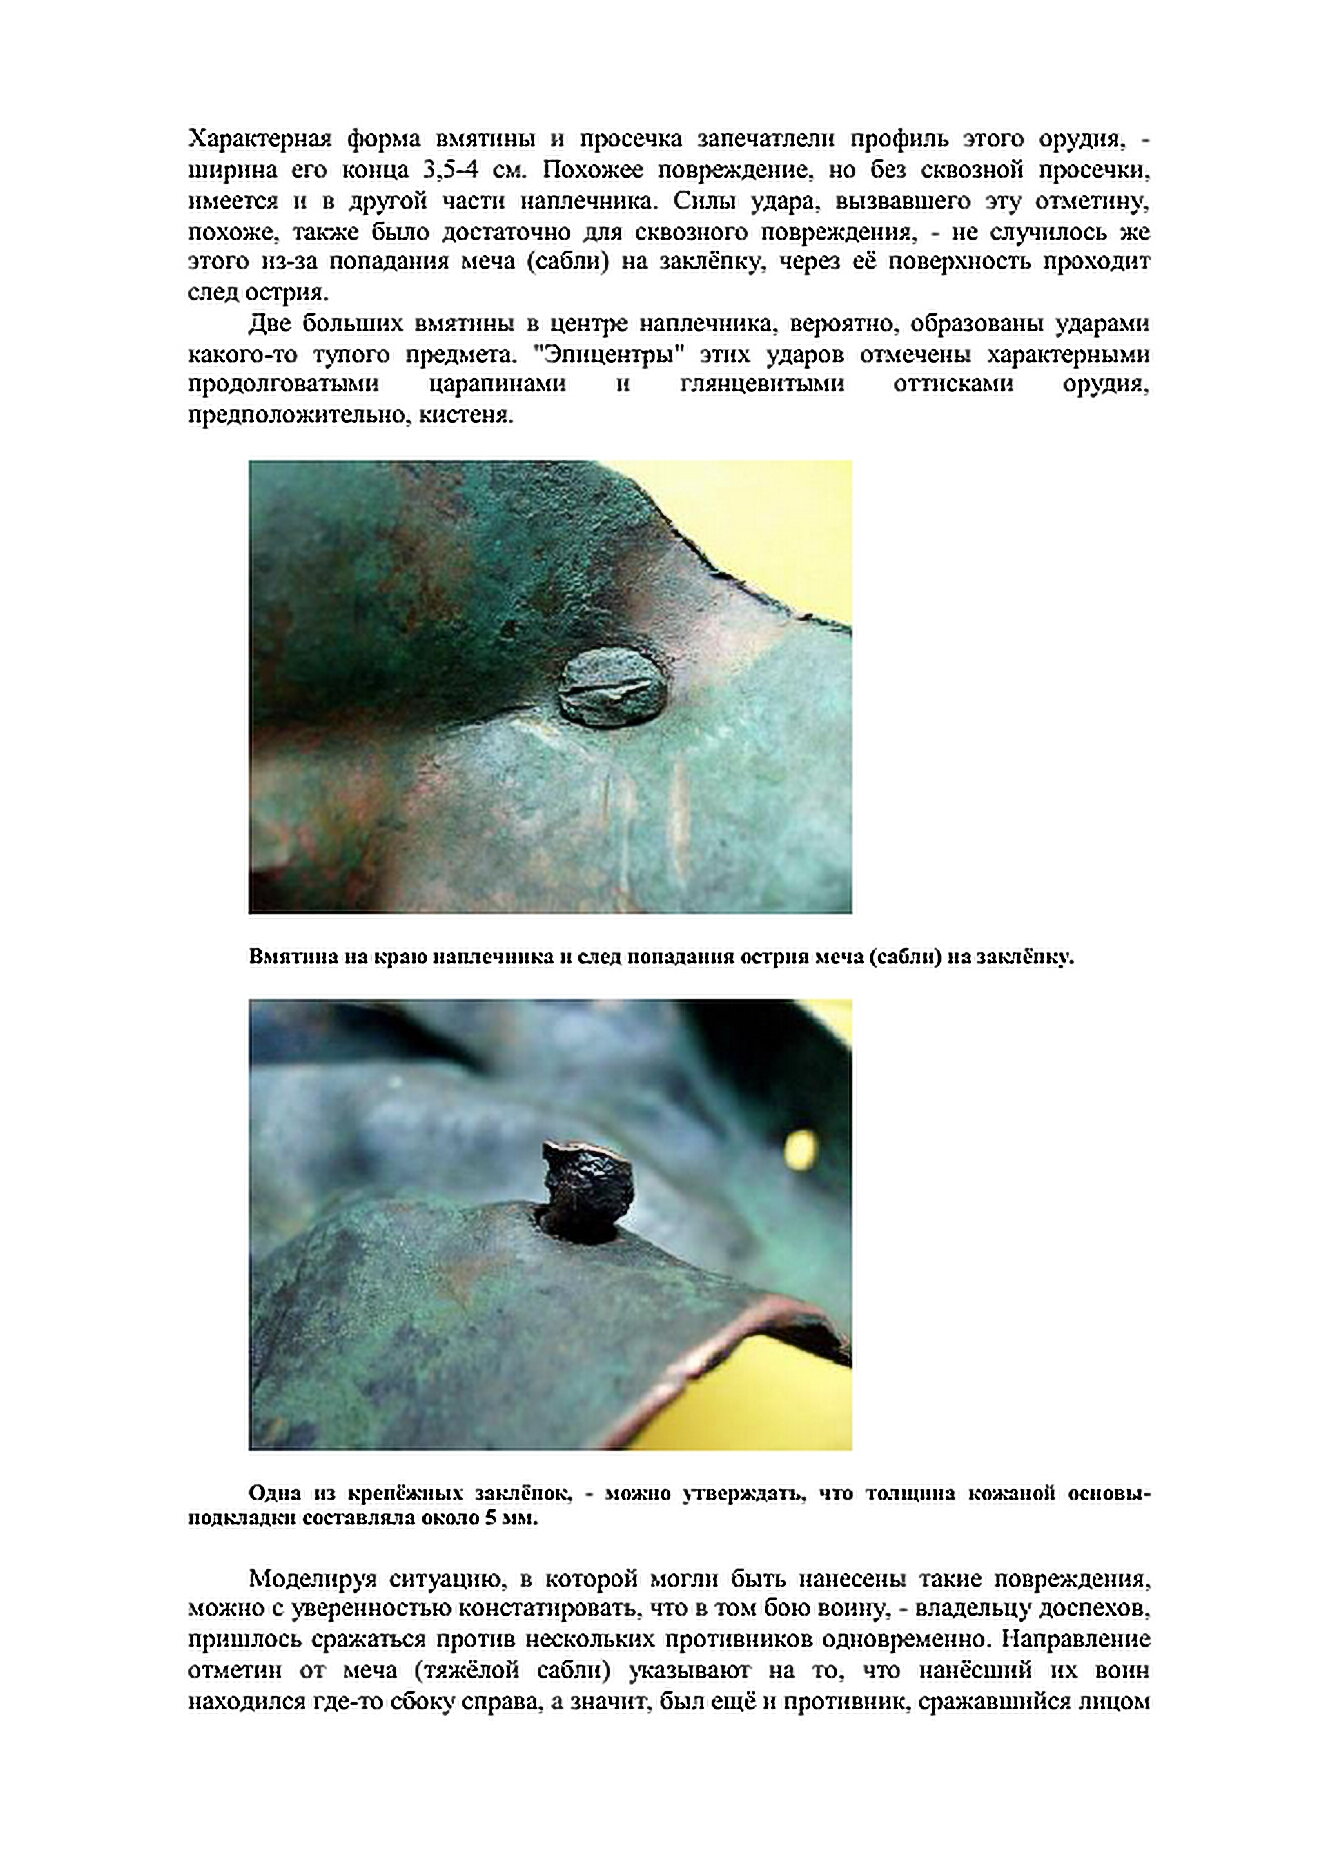 http://s5.uploads.ru/tW7sm.jpg